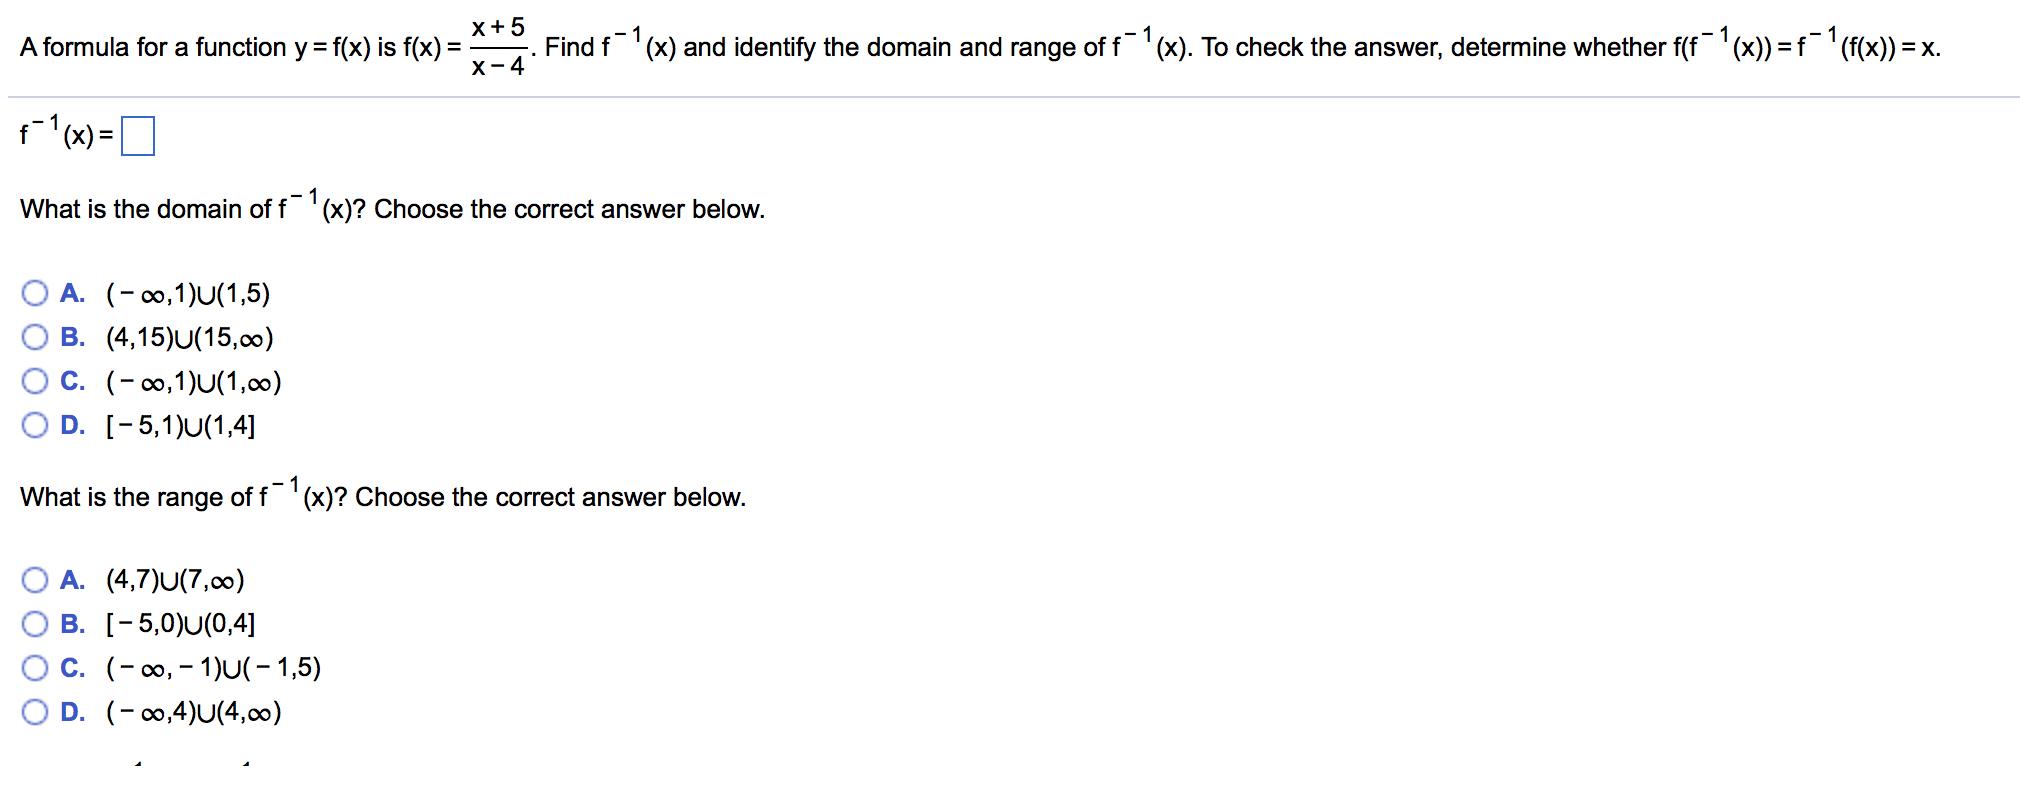 A Formula For A Function Y = F(x) Is F(x) = X + 5/... | Chegg.com